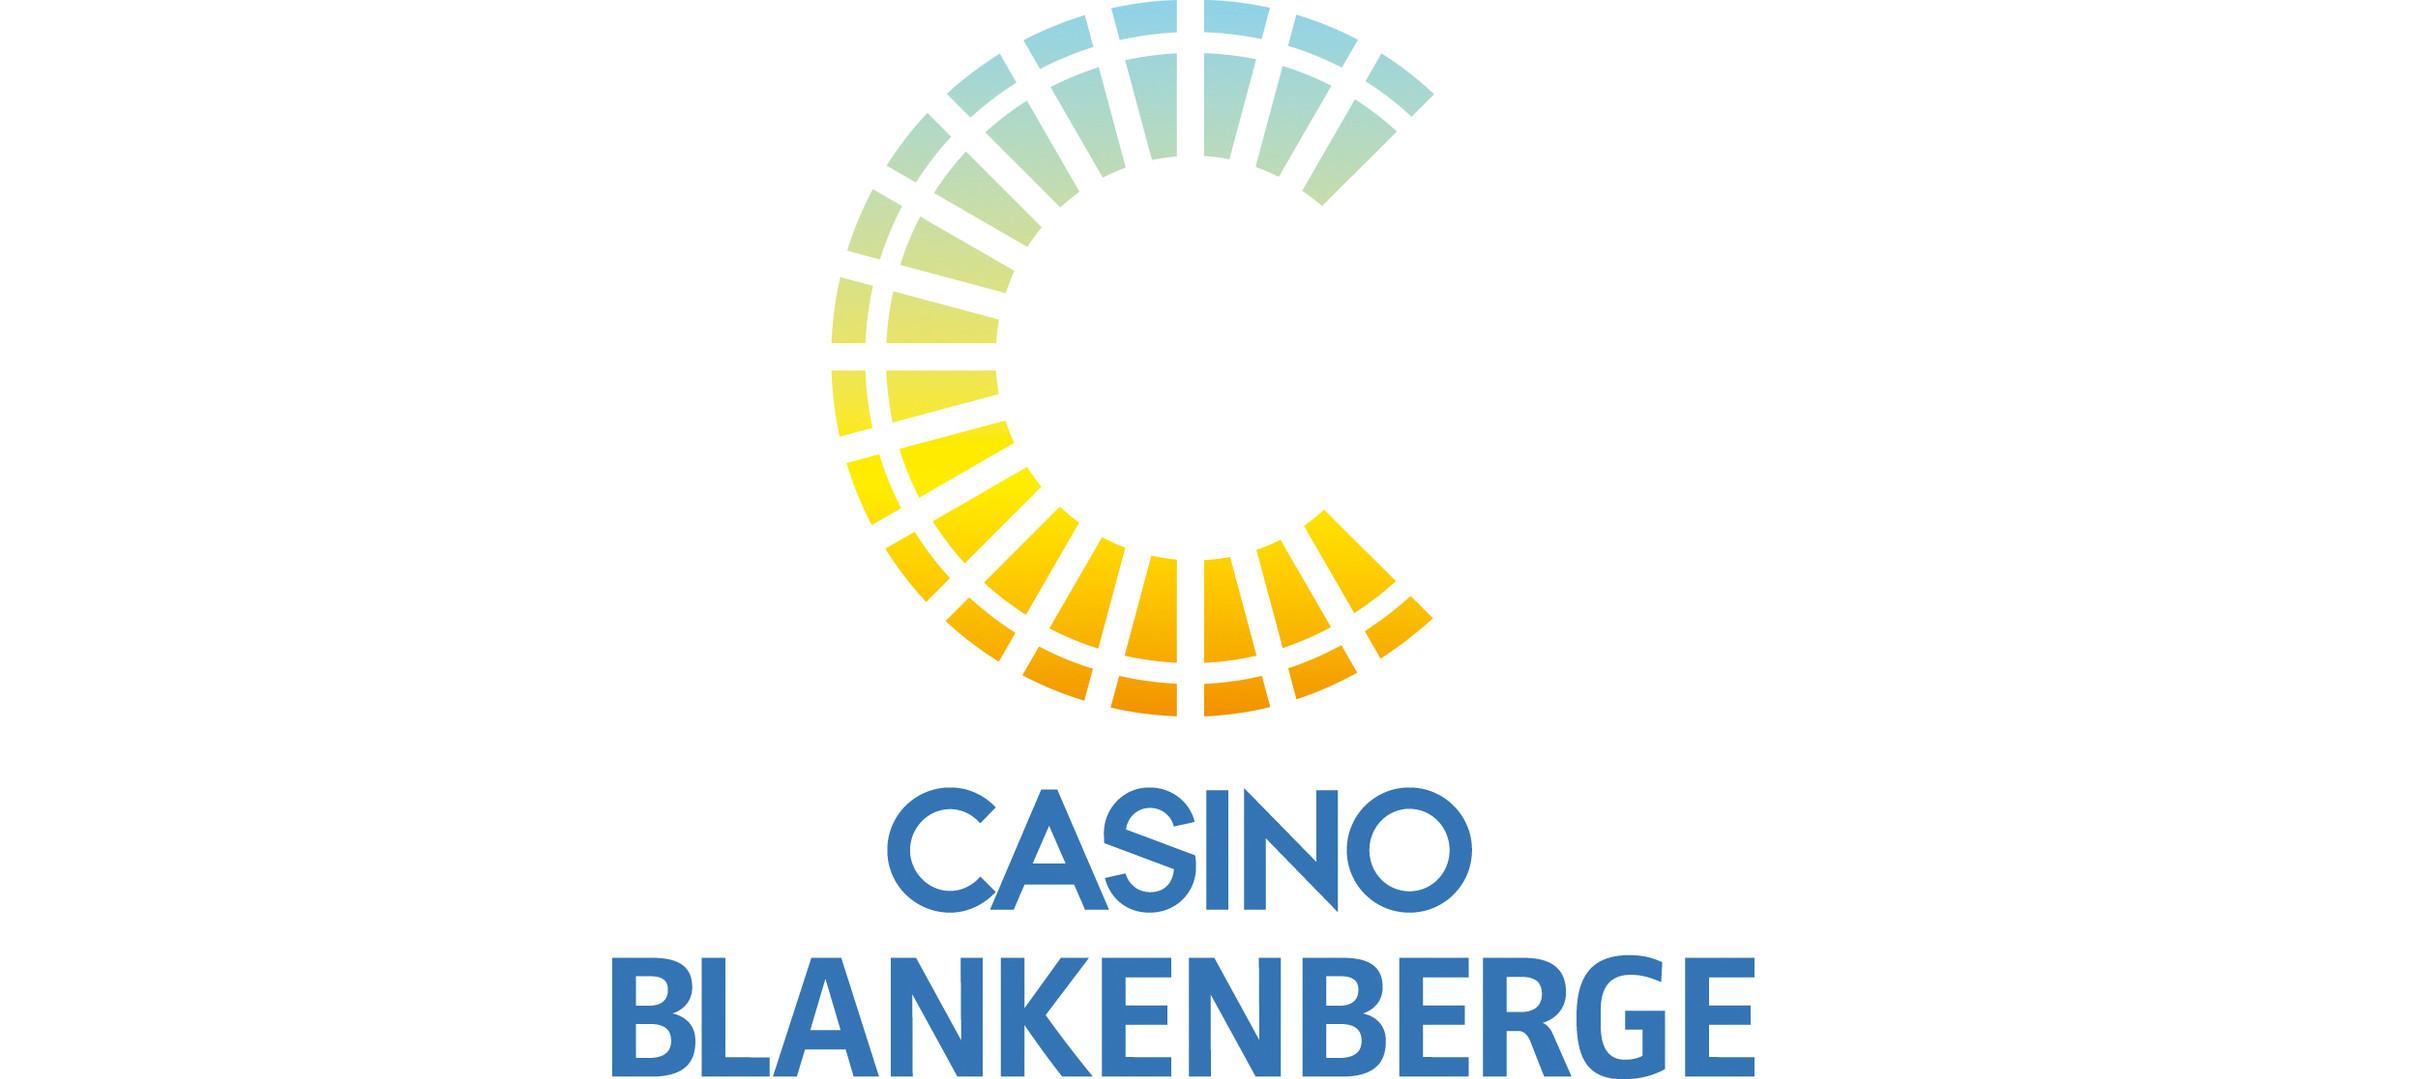 Casino-Blankenberge.jpg